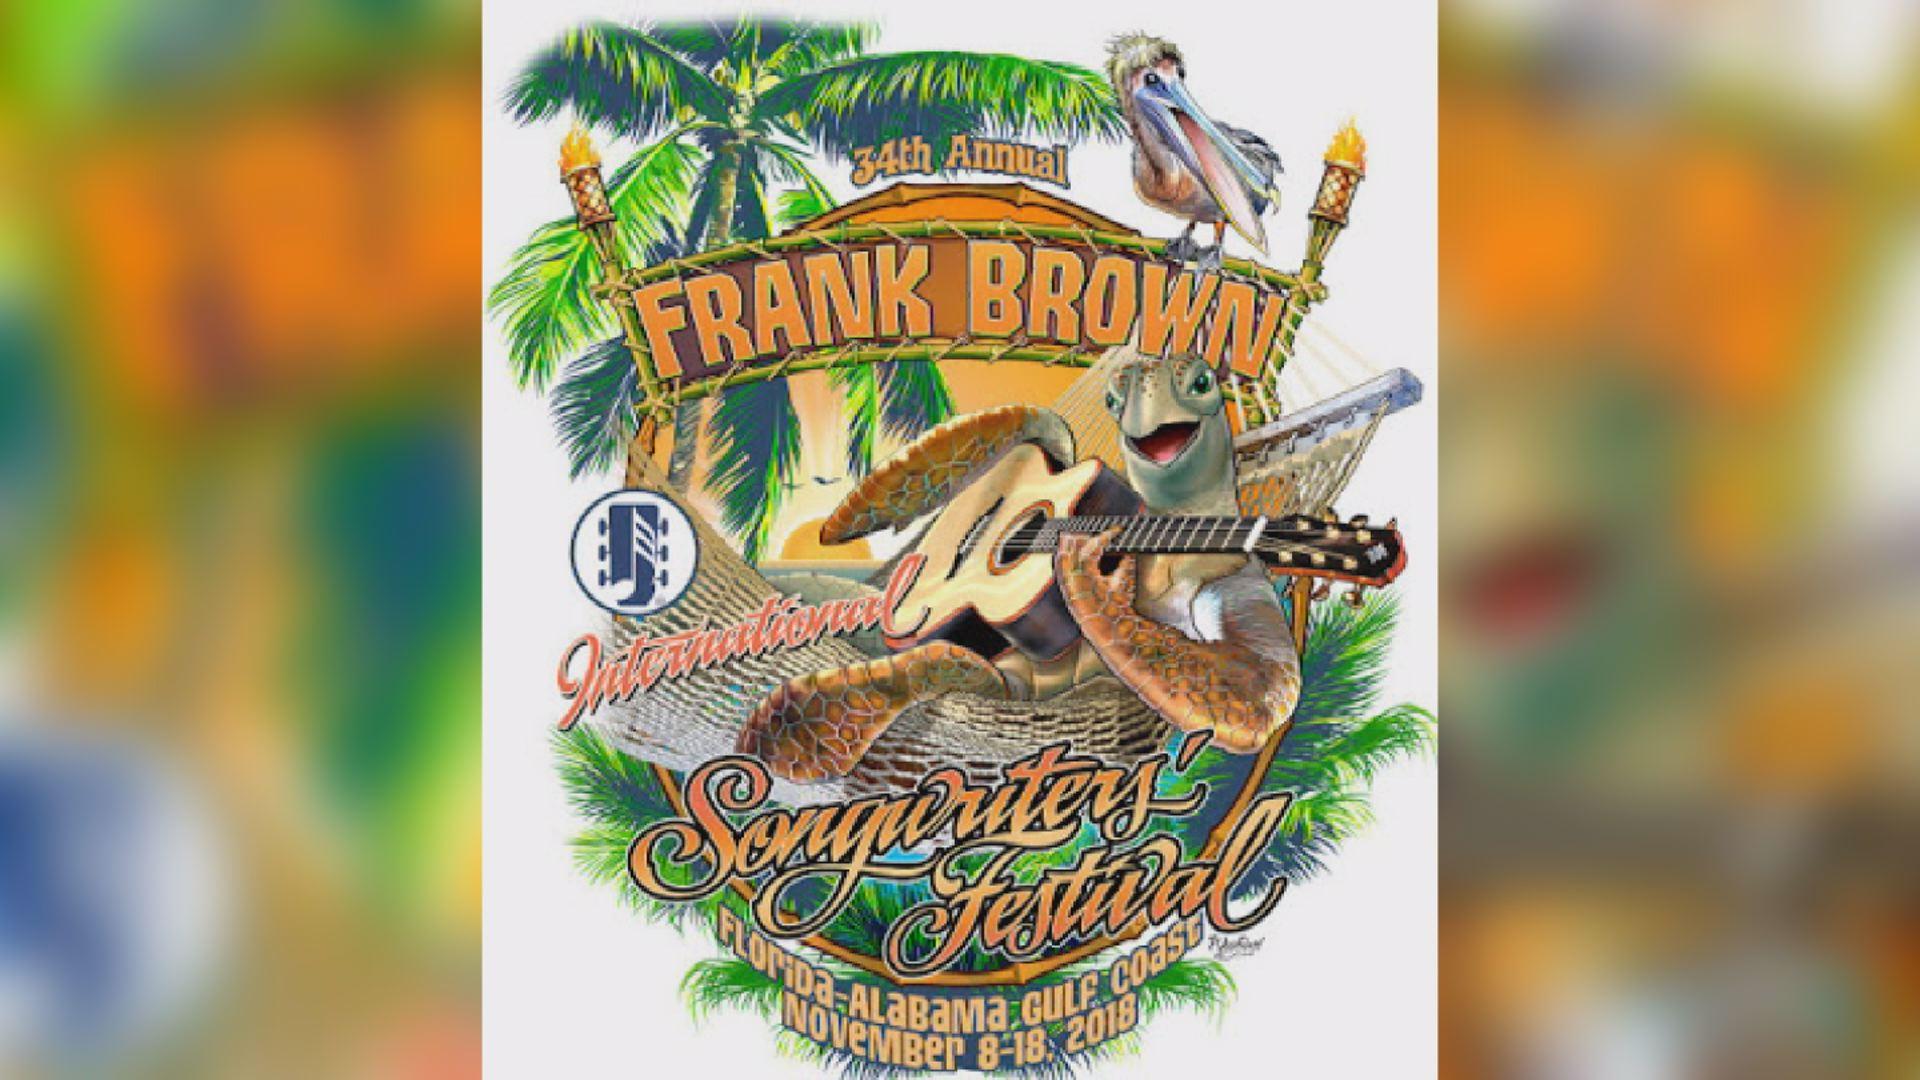 Frank_Brown_International_Songwriters_Festival-2018_cover_1542127950351.jpg